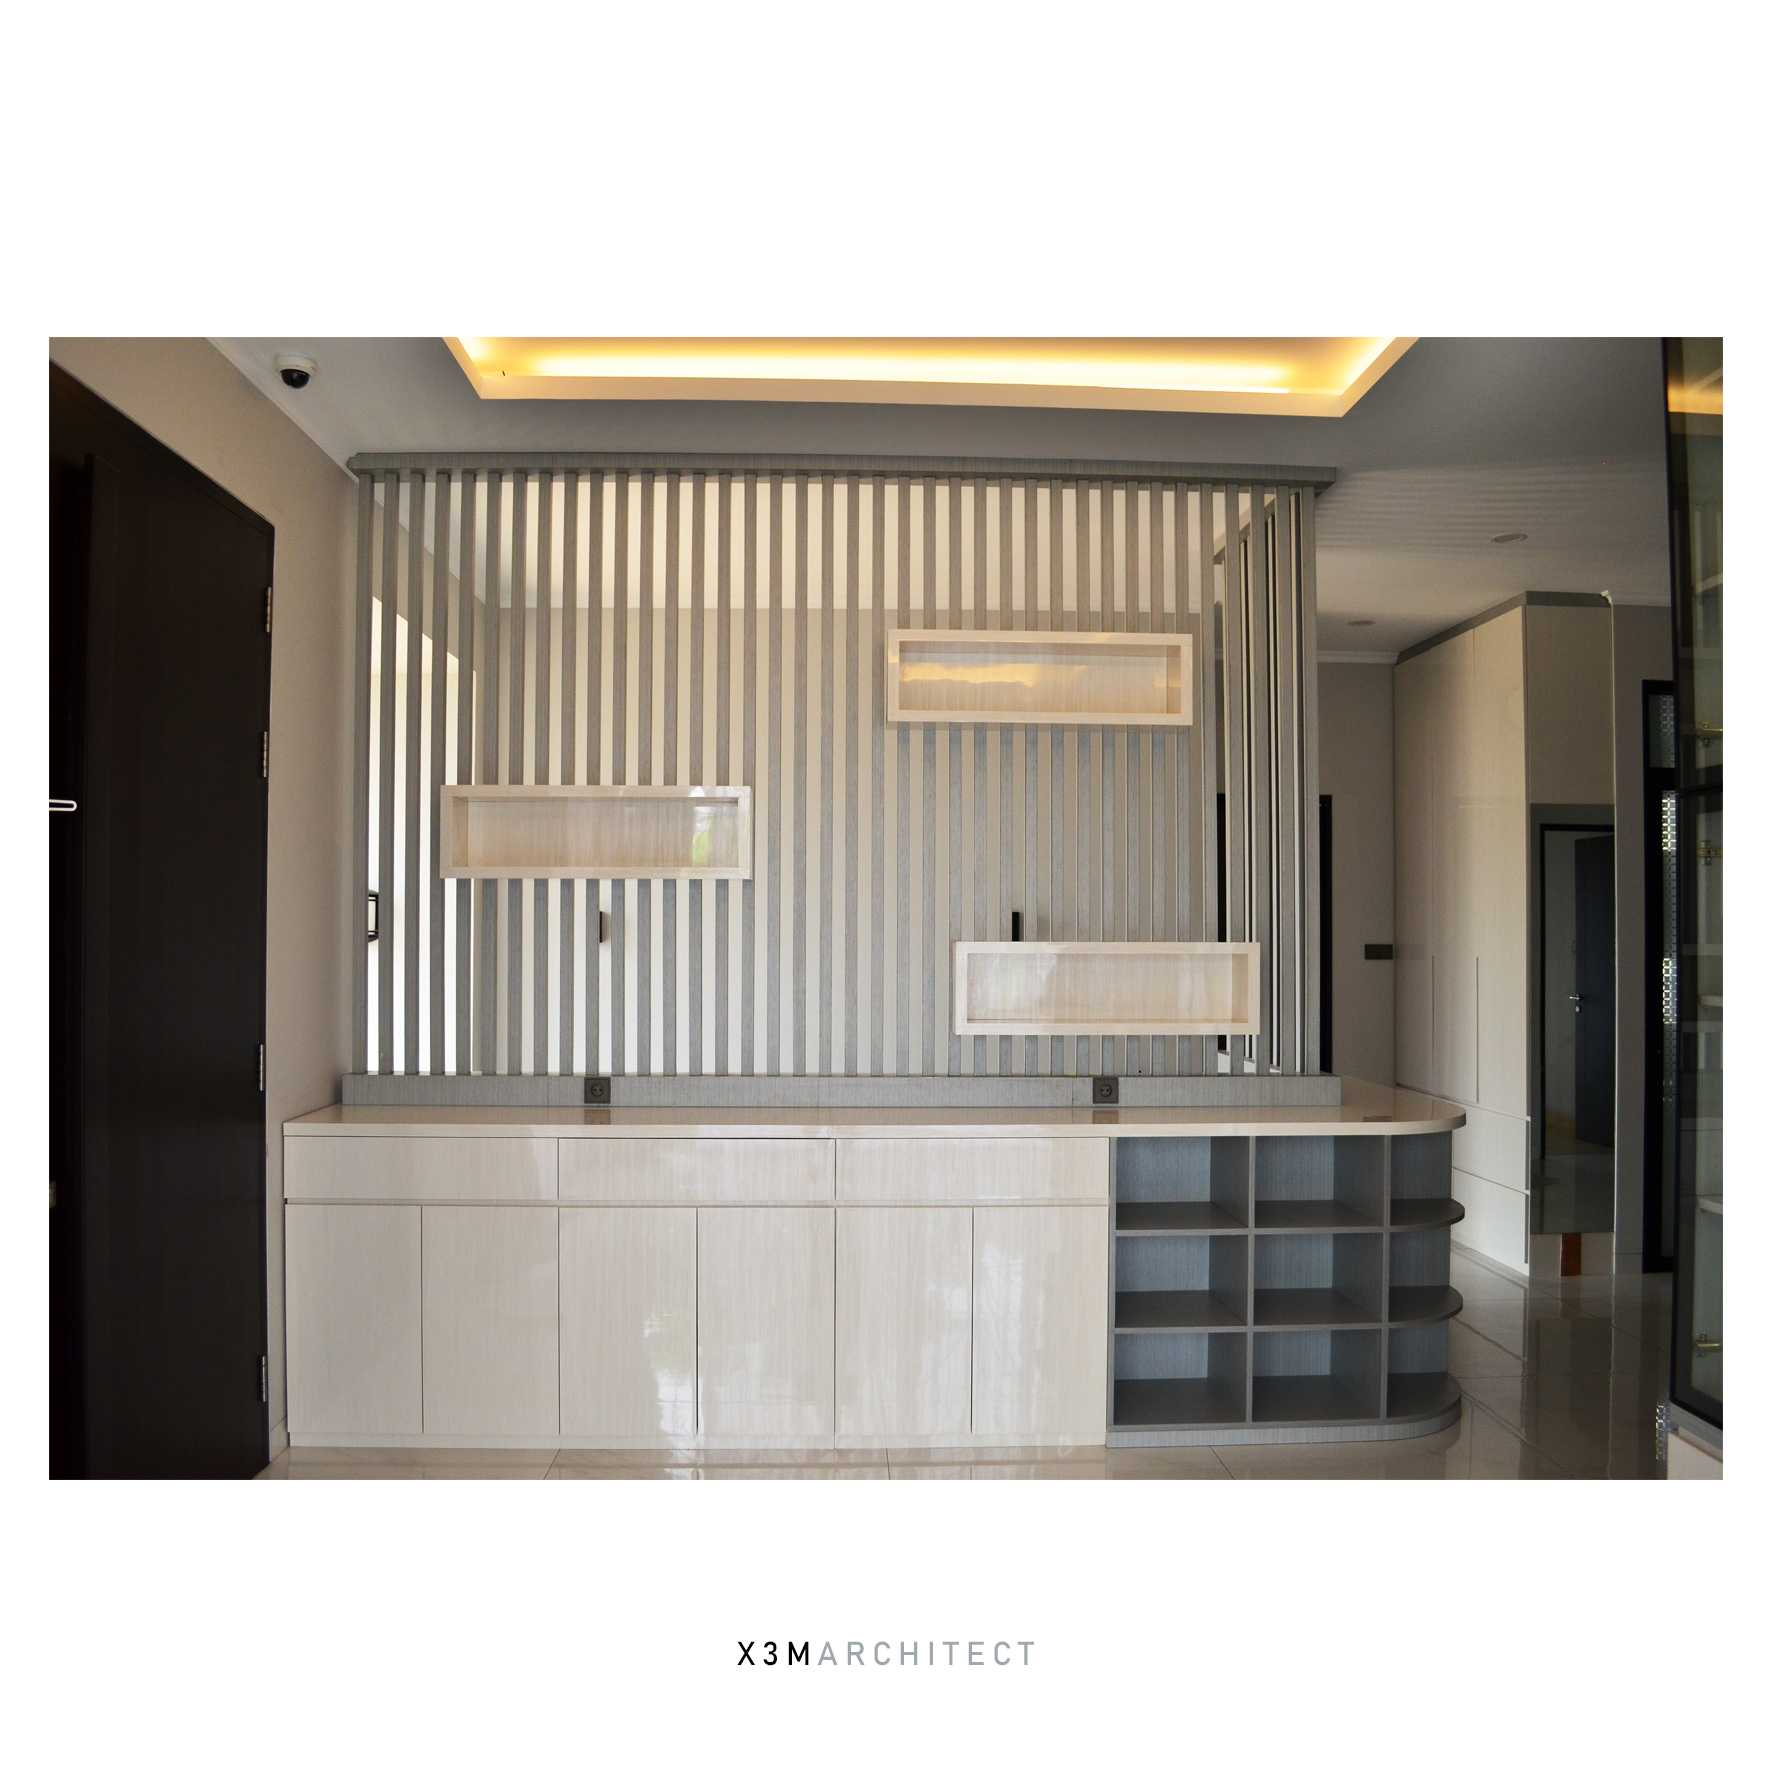 X3M Architects Nittaya A5 1 House Sampora, Kec. Cisauk, Tangerang, Banten 15345, Indonesia Sampora, Kec. Cisauk, Tangerang, Banten 15345, Indonesia X3M-Architects-Nittaya-A5-1-House  80367